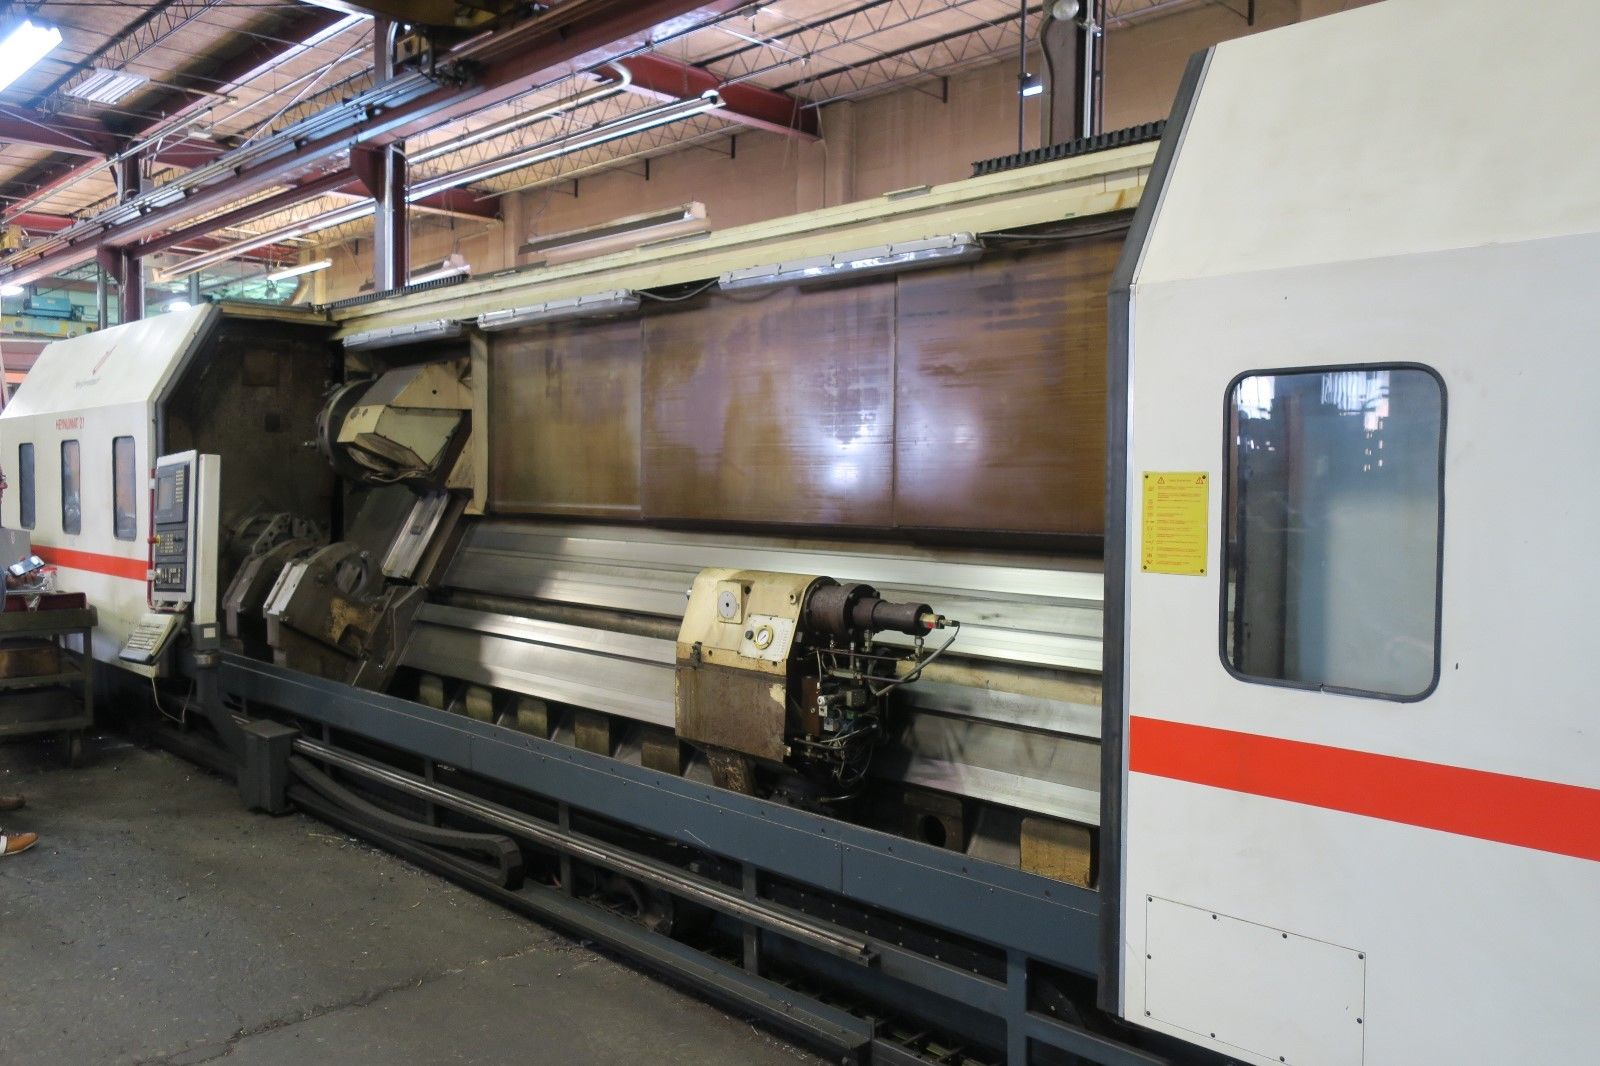 Heyligenstaedt Heynumat 21U/6000 CNC Slant Bed Lathe 28